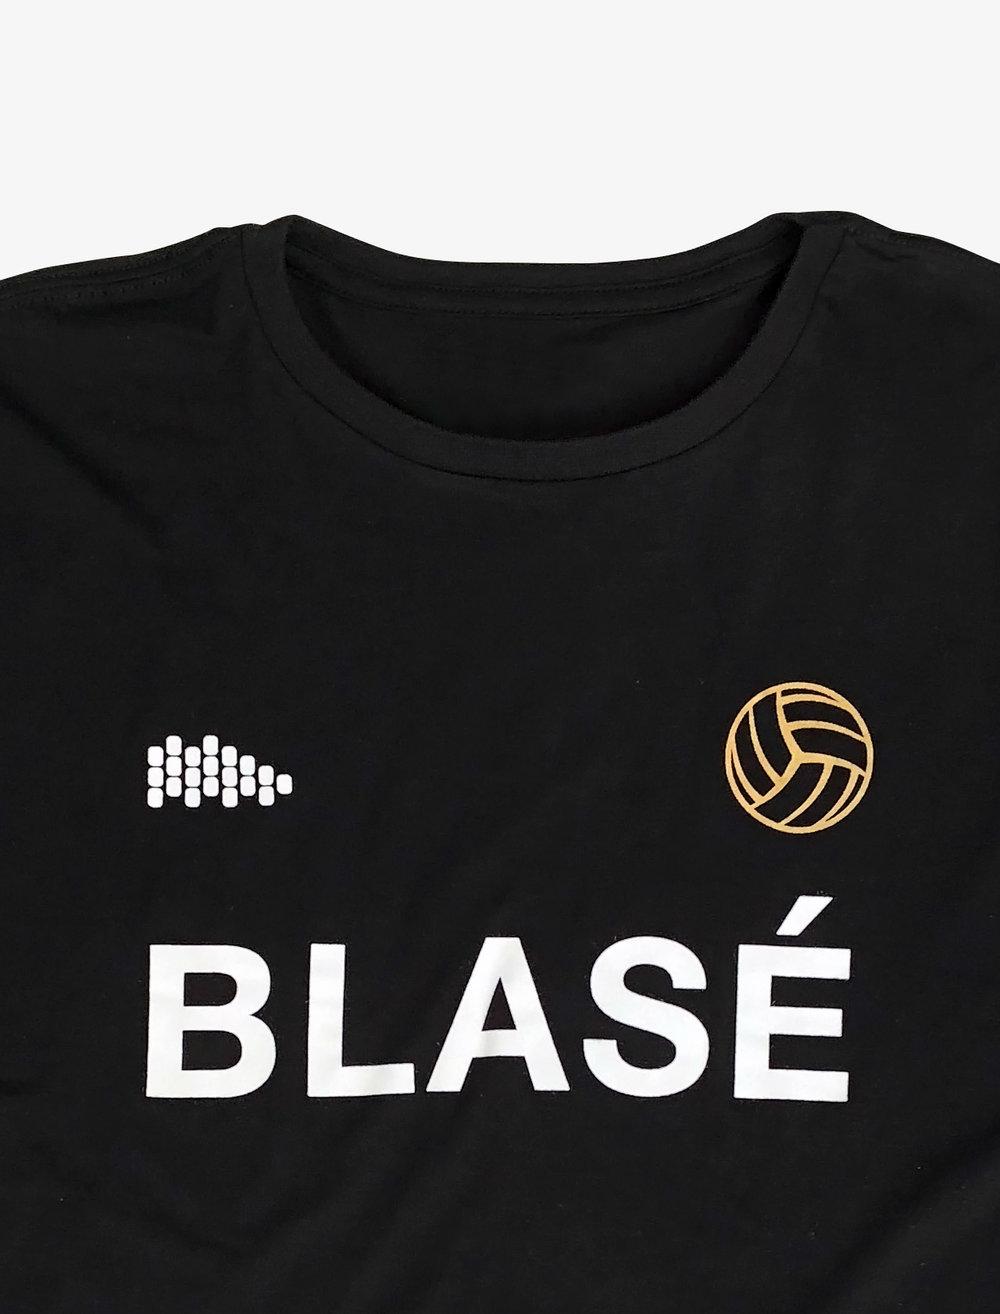 BLASE_3.jpg